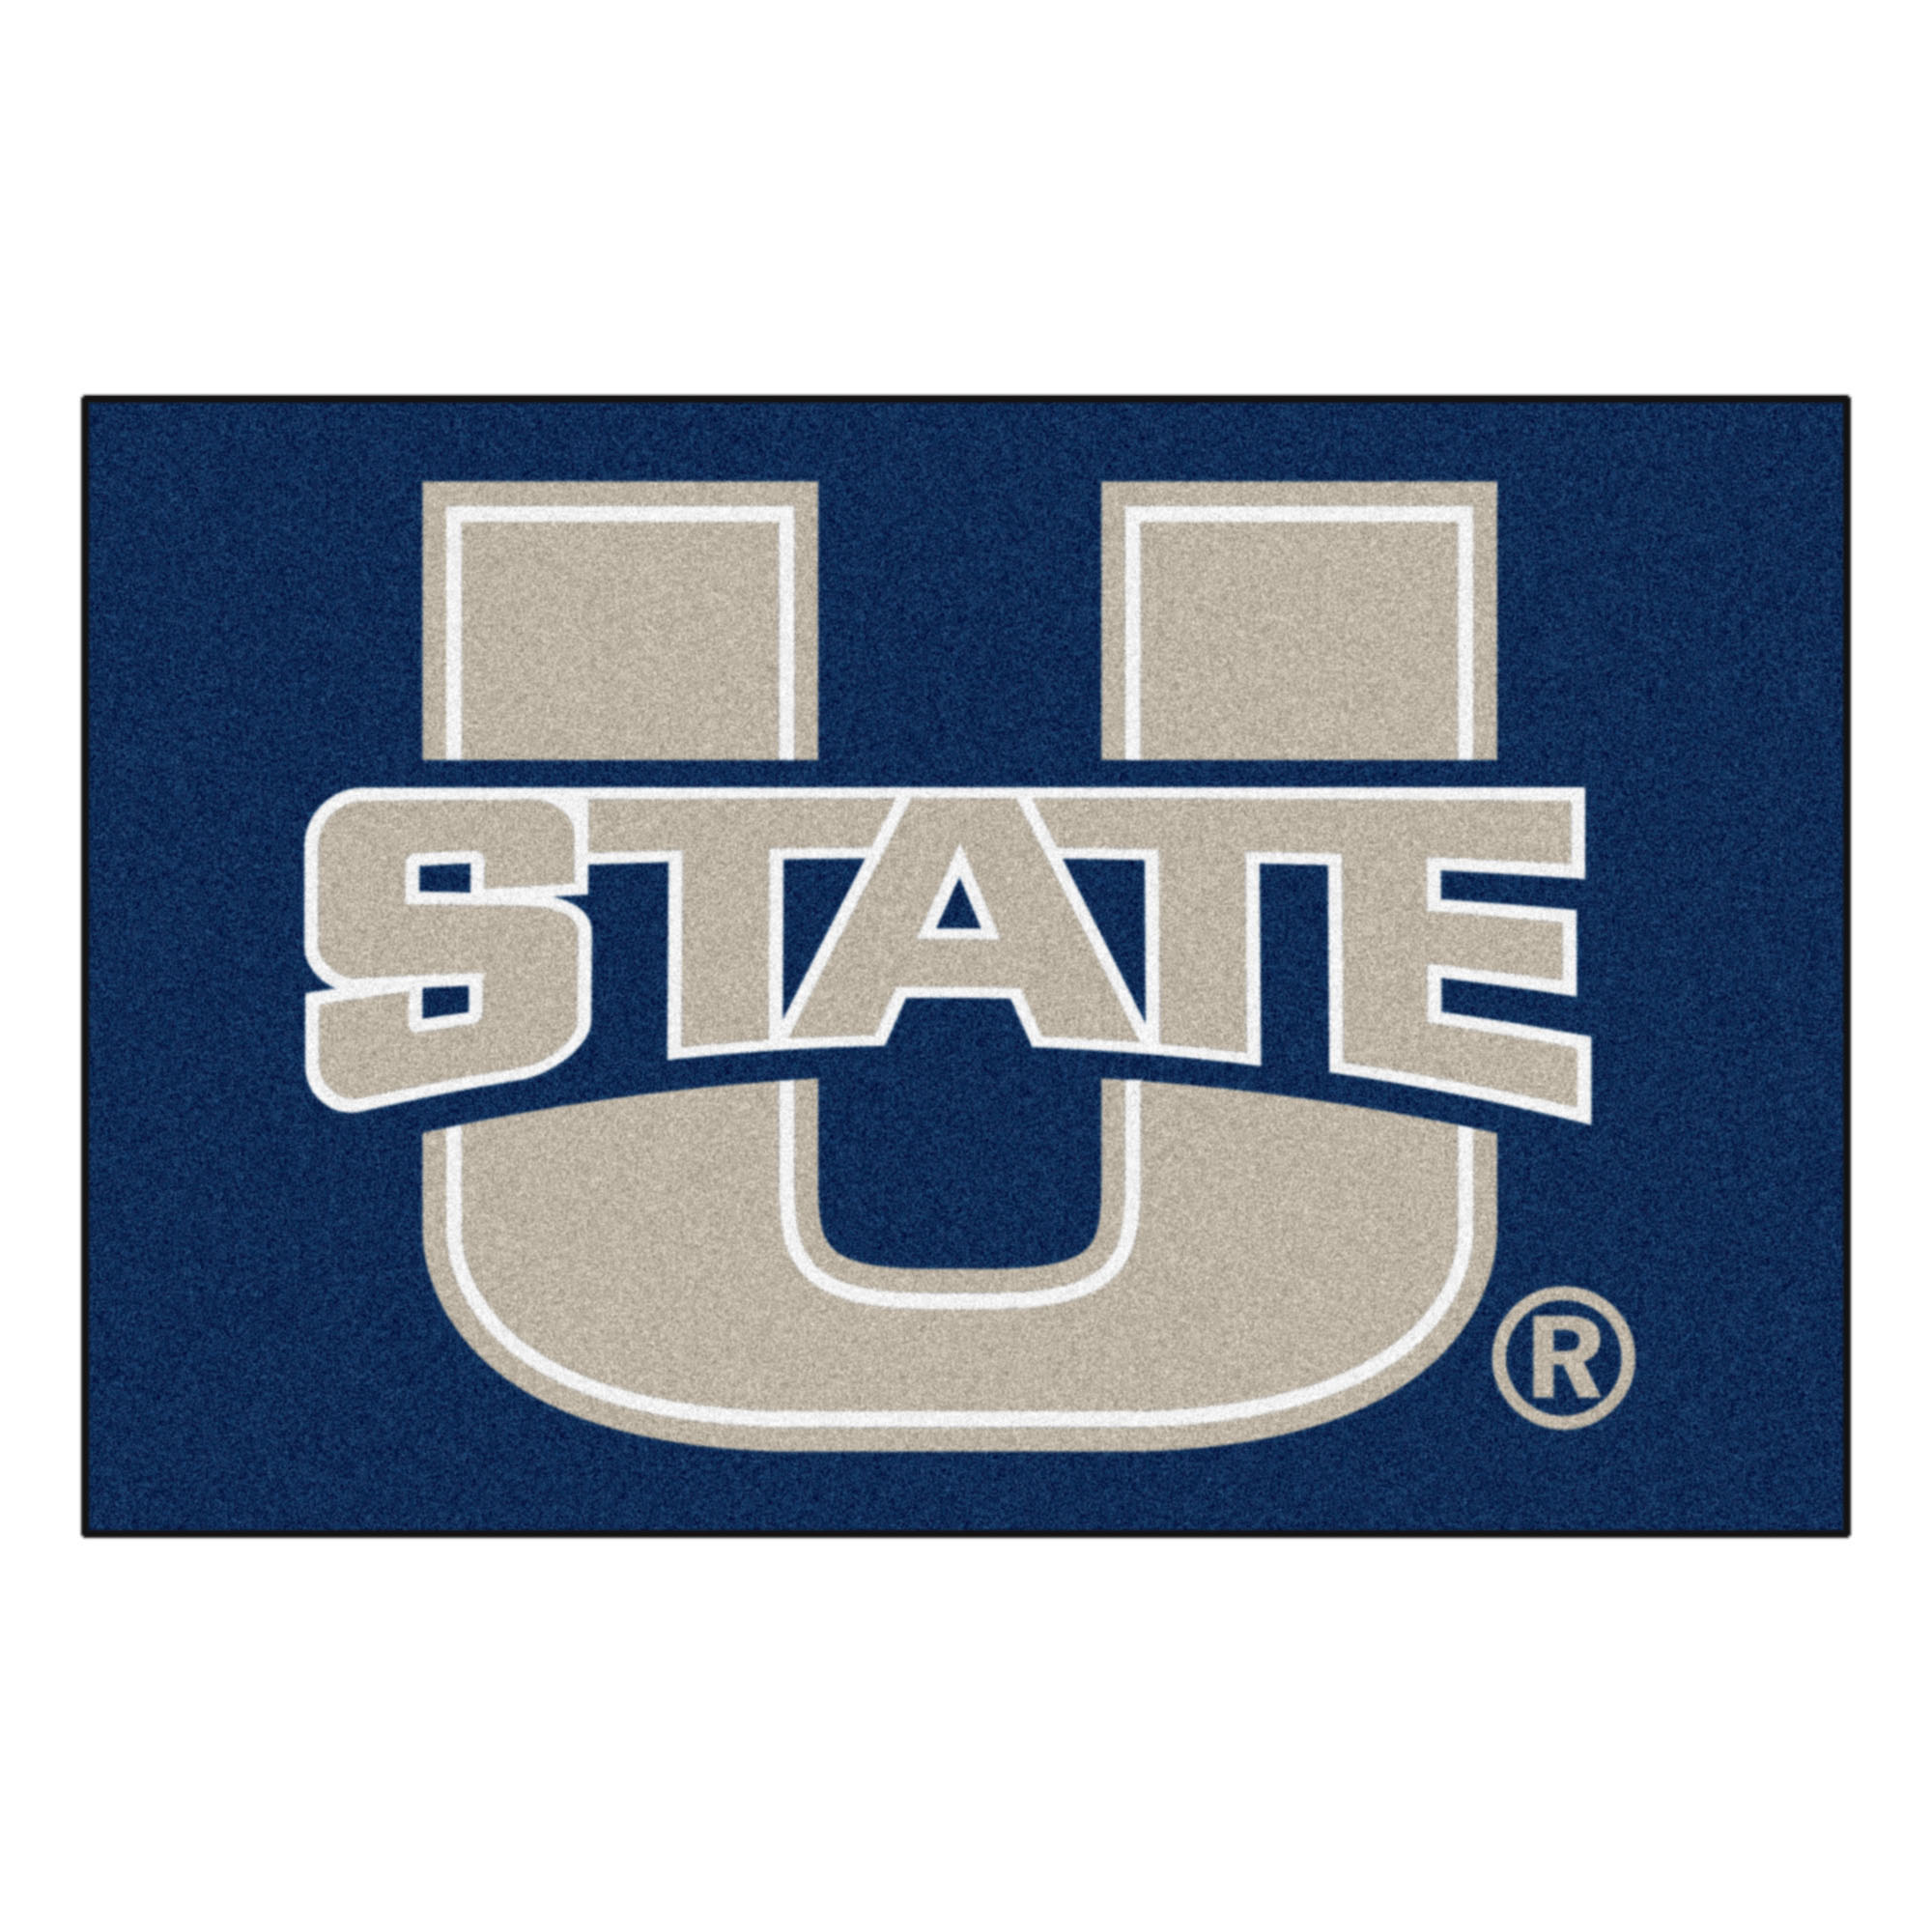 2538 Fanmats College NCAA Utah State University 19 Inch x 30 Inch Nylon Face durable Non-skid chromojet-printed washable Rectangular Starter Mat